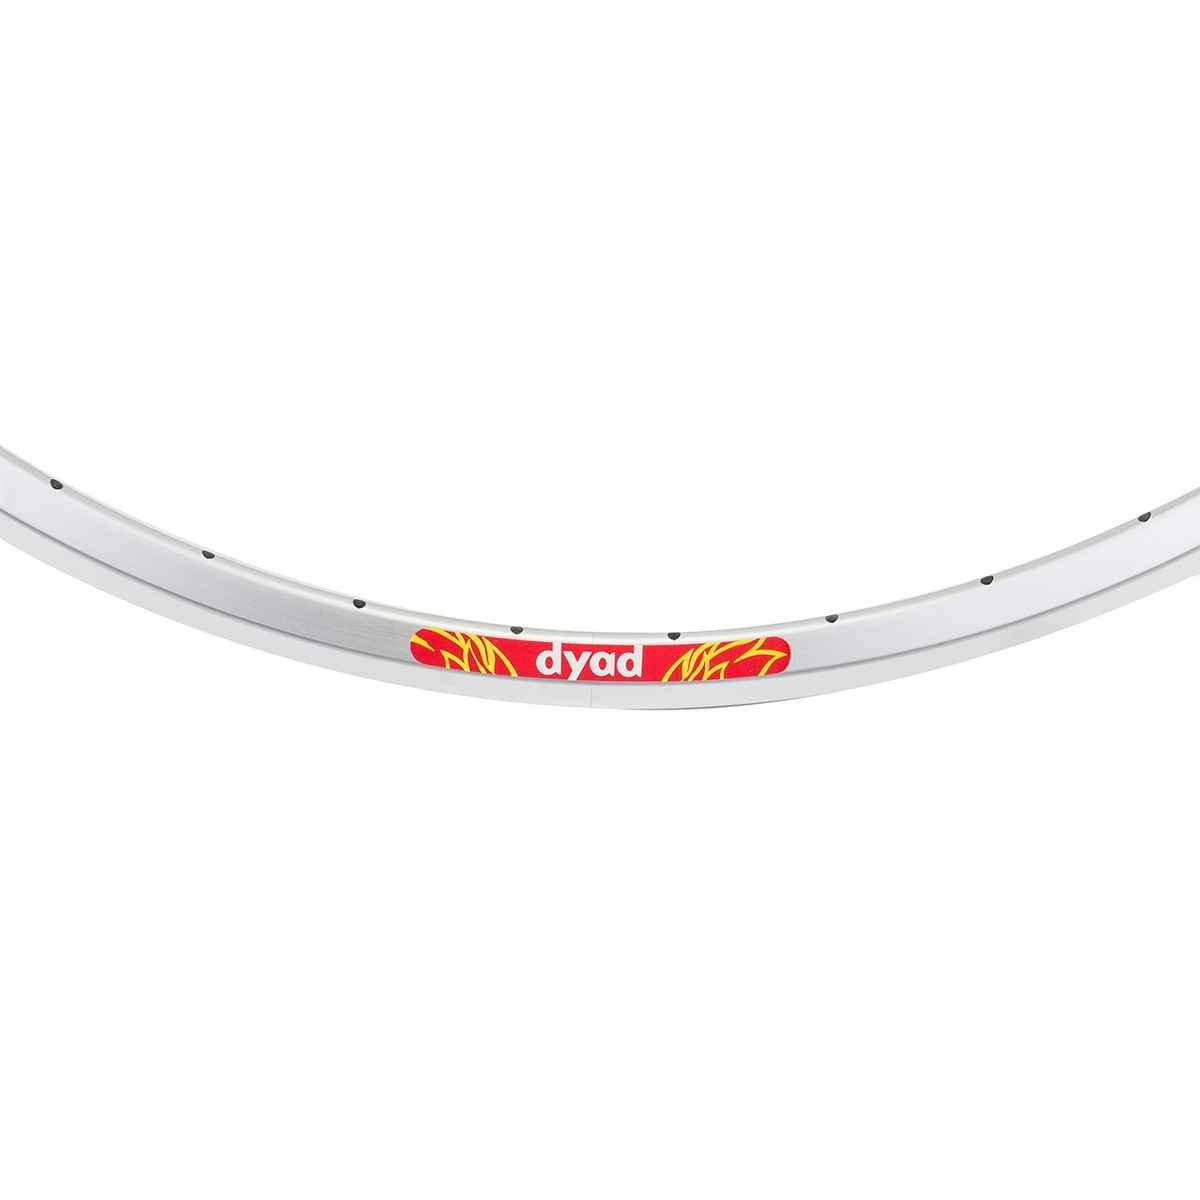 Velocity Dyad Rim - 700 x 20/23 - 36H Silver